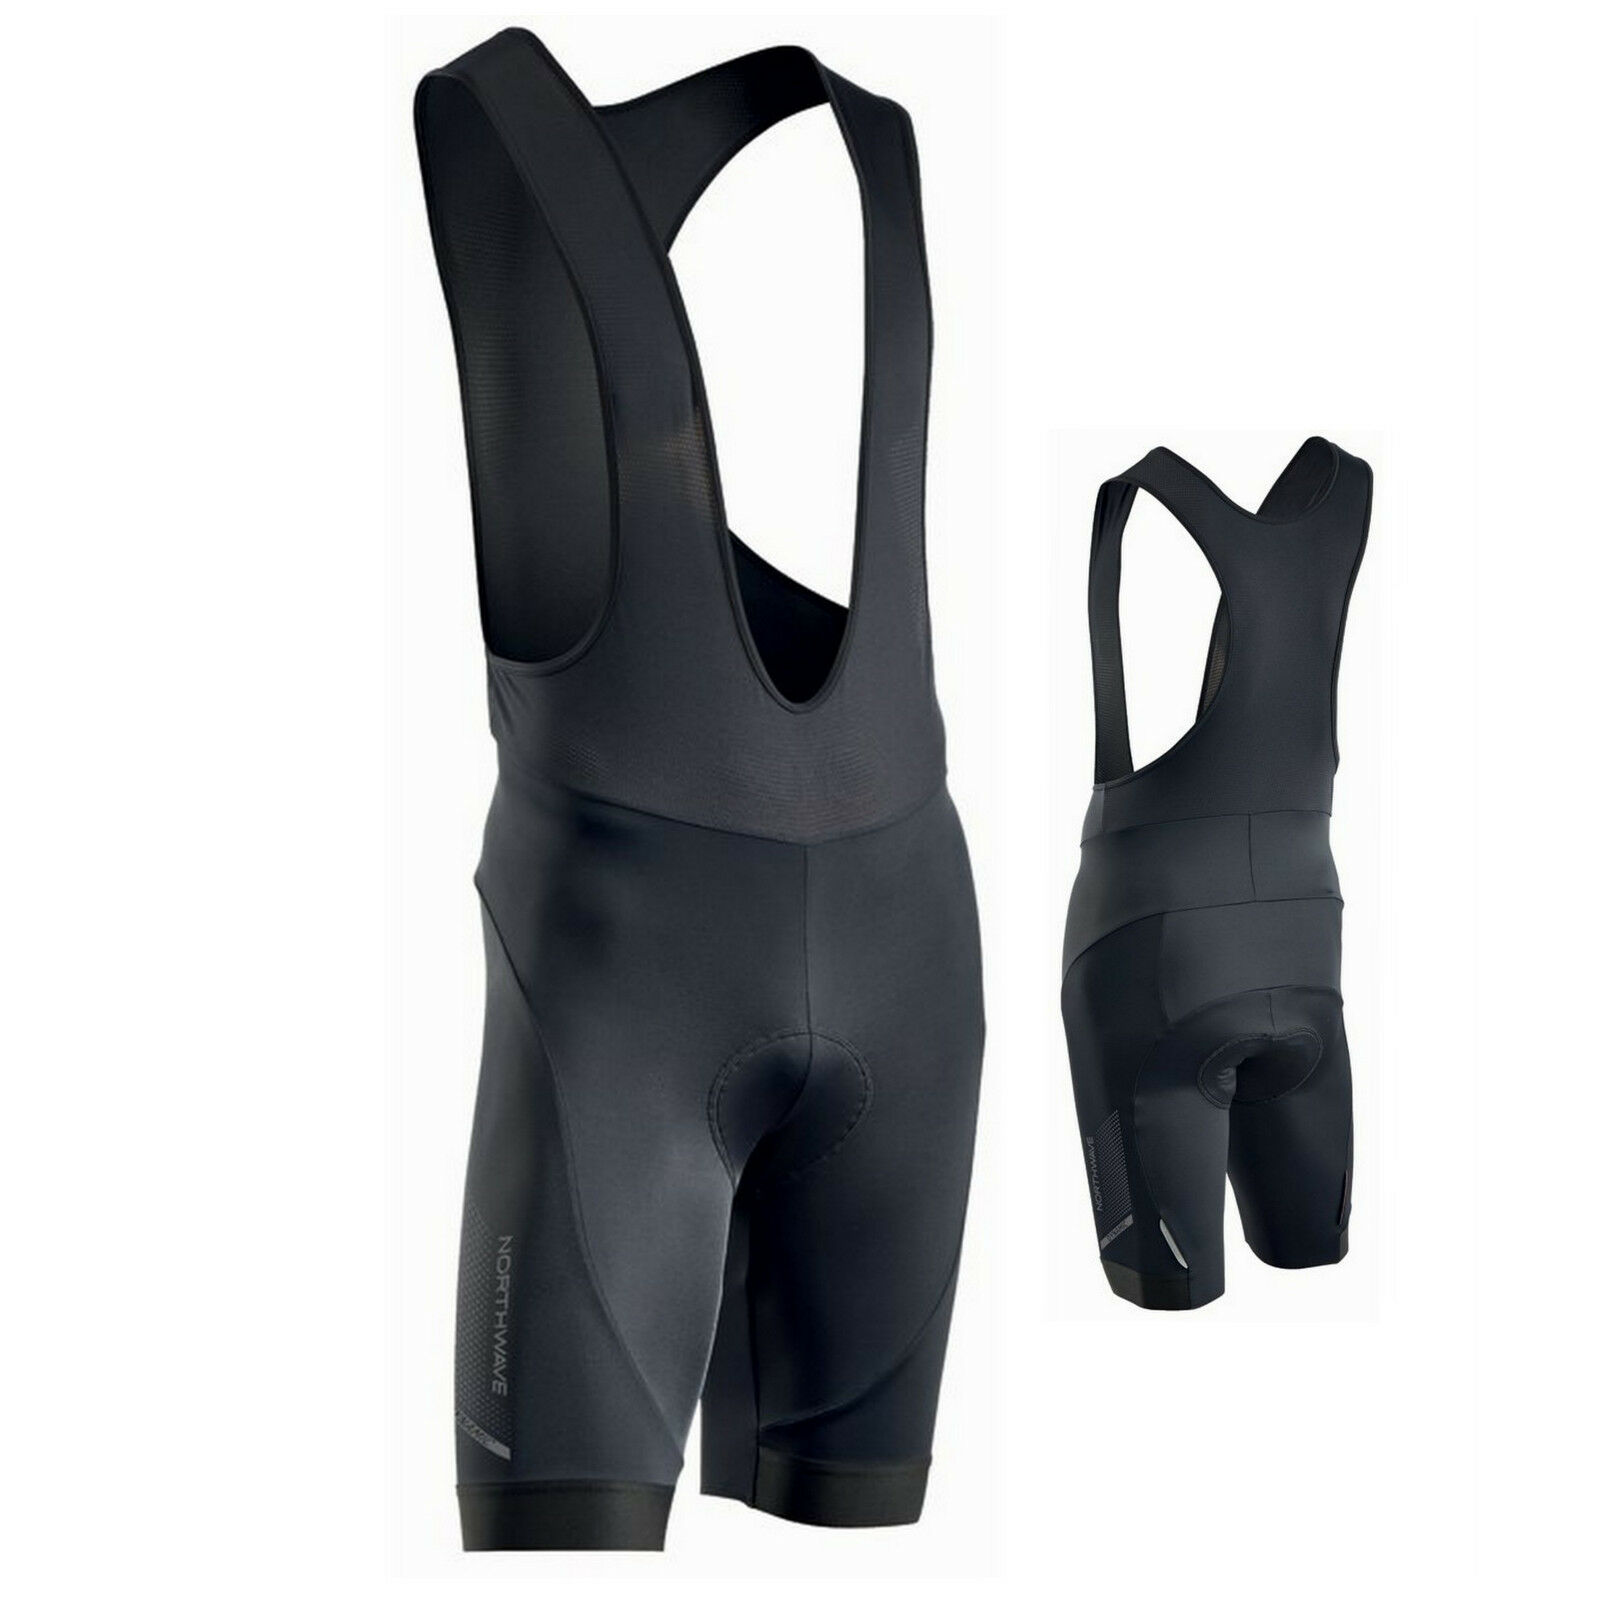 Northwave Dynamic Kinetic Cycling Bib Shorts K110 Pad size S M New